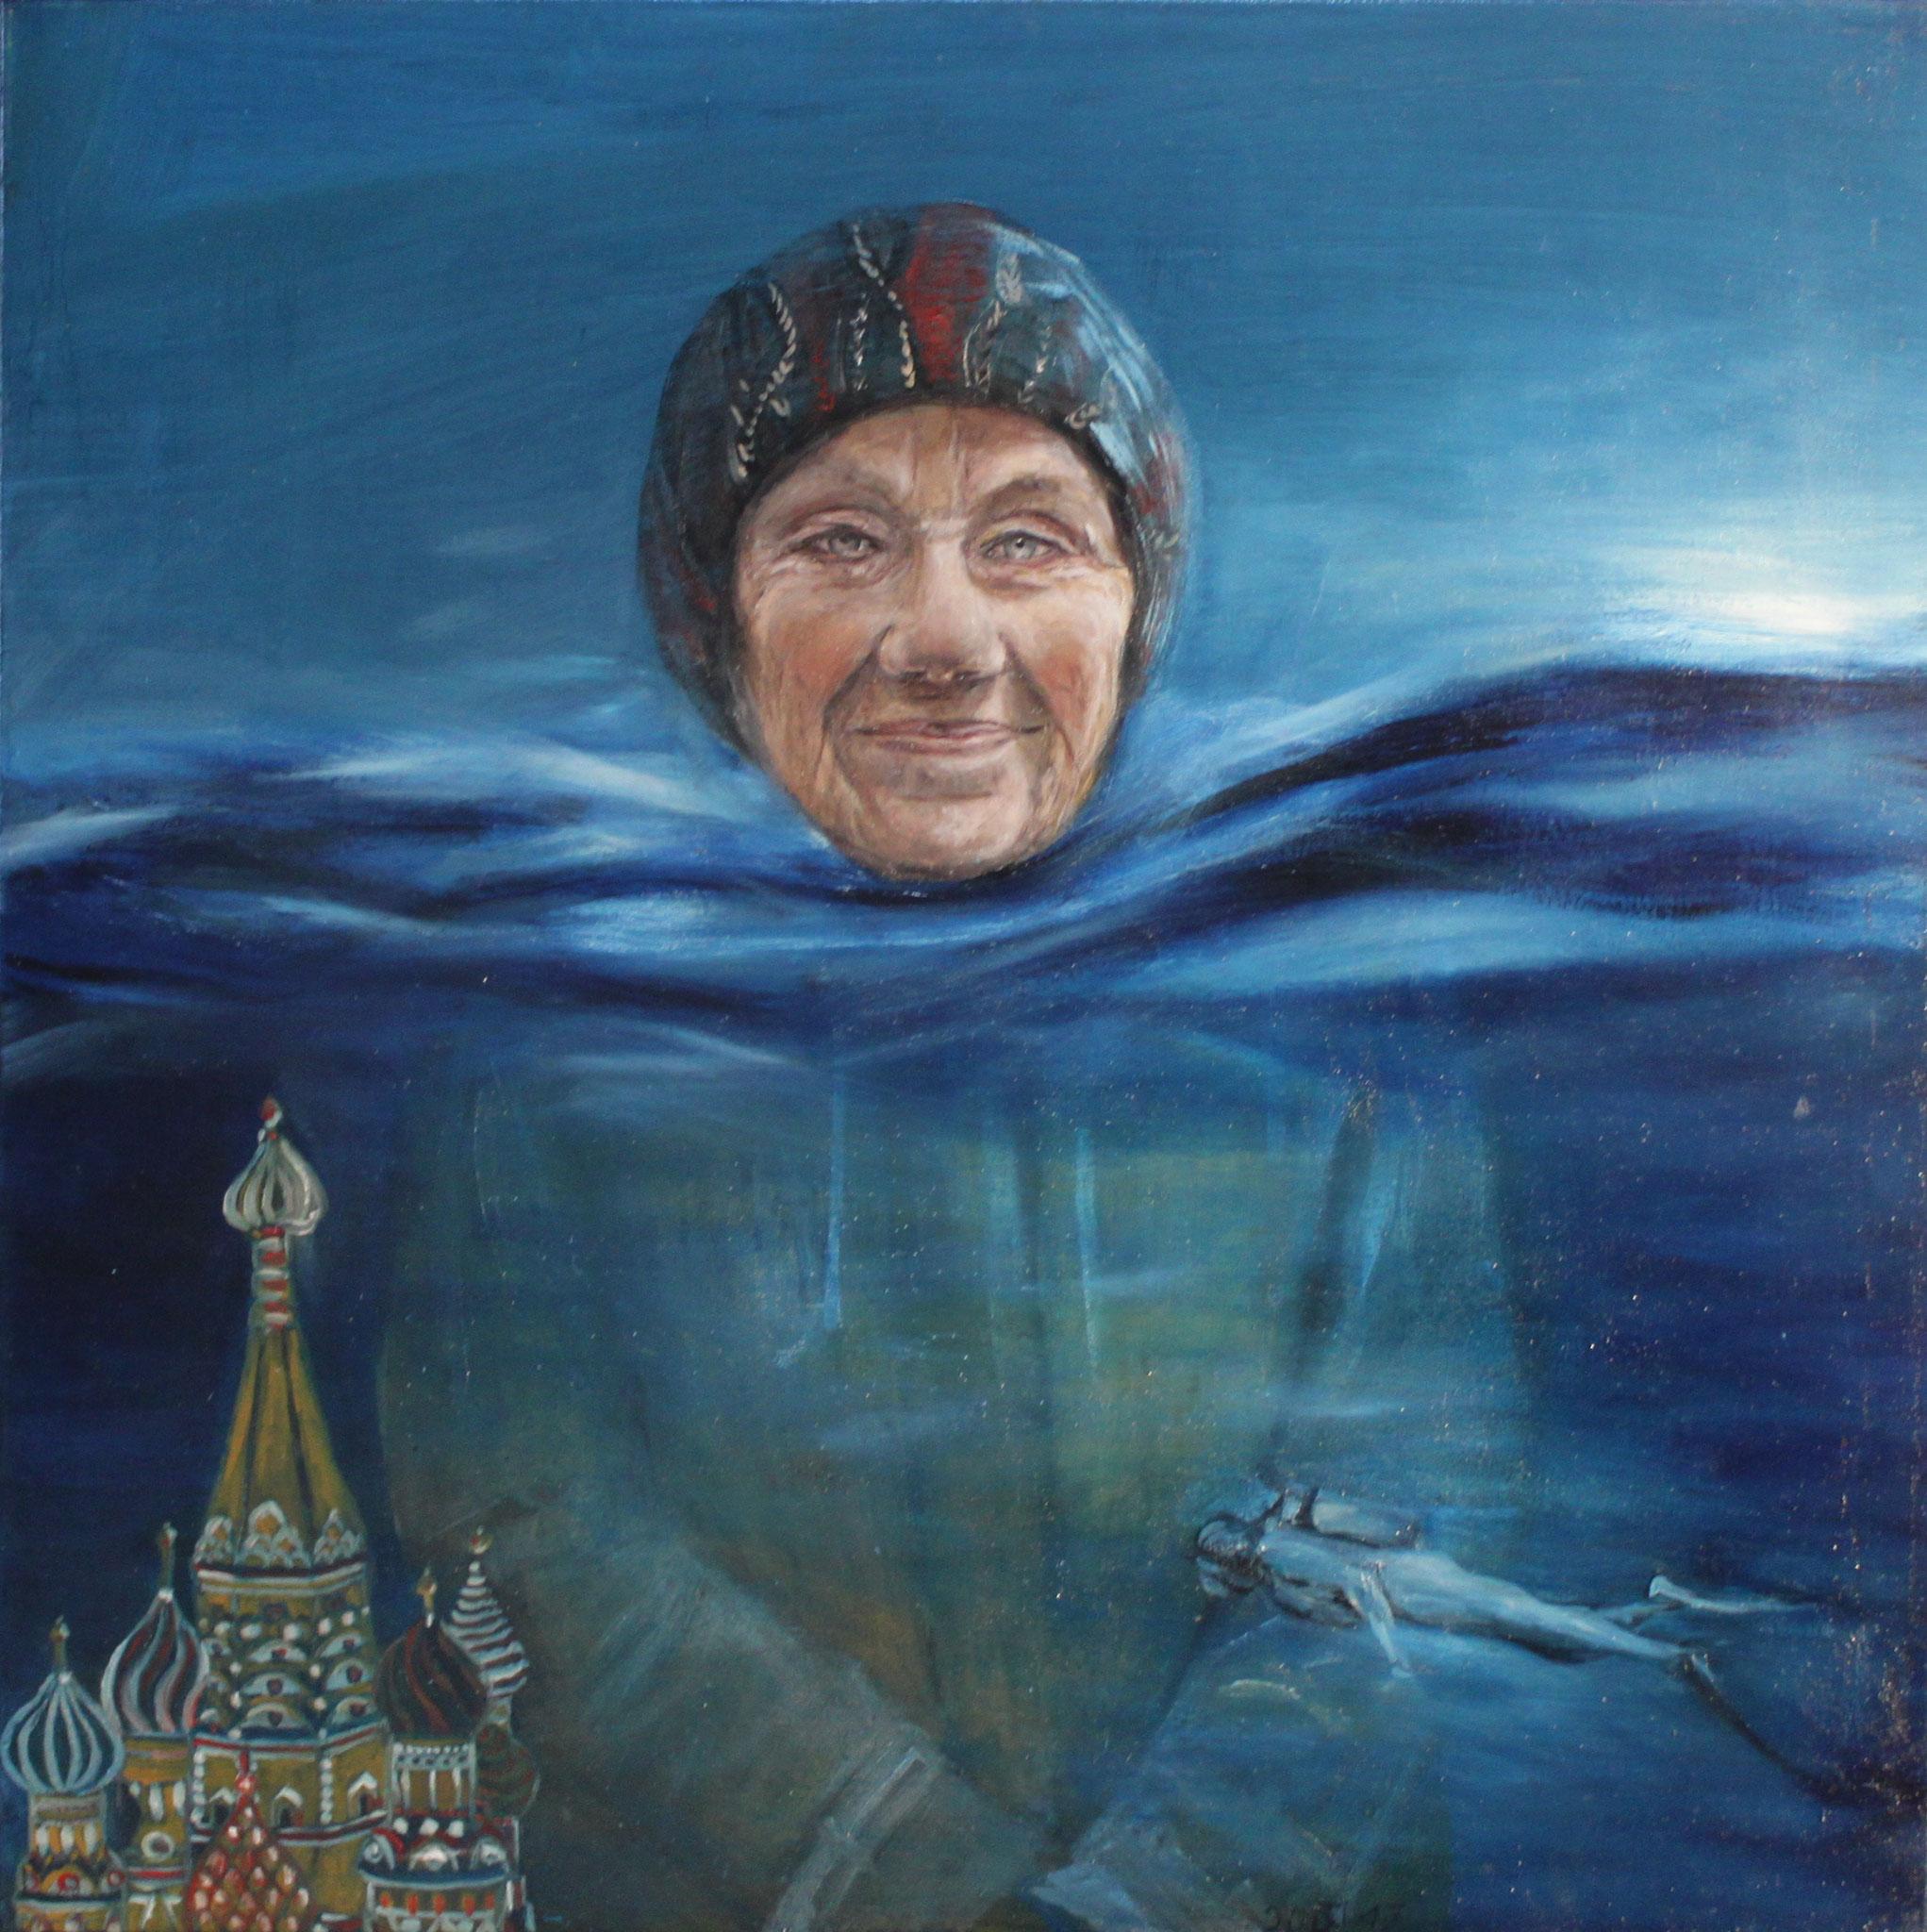 Emma, 2017, Öl auf Leinwand, 80 cm x 80 cm x 4 cm